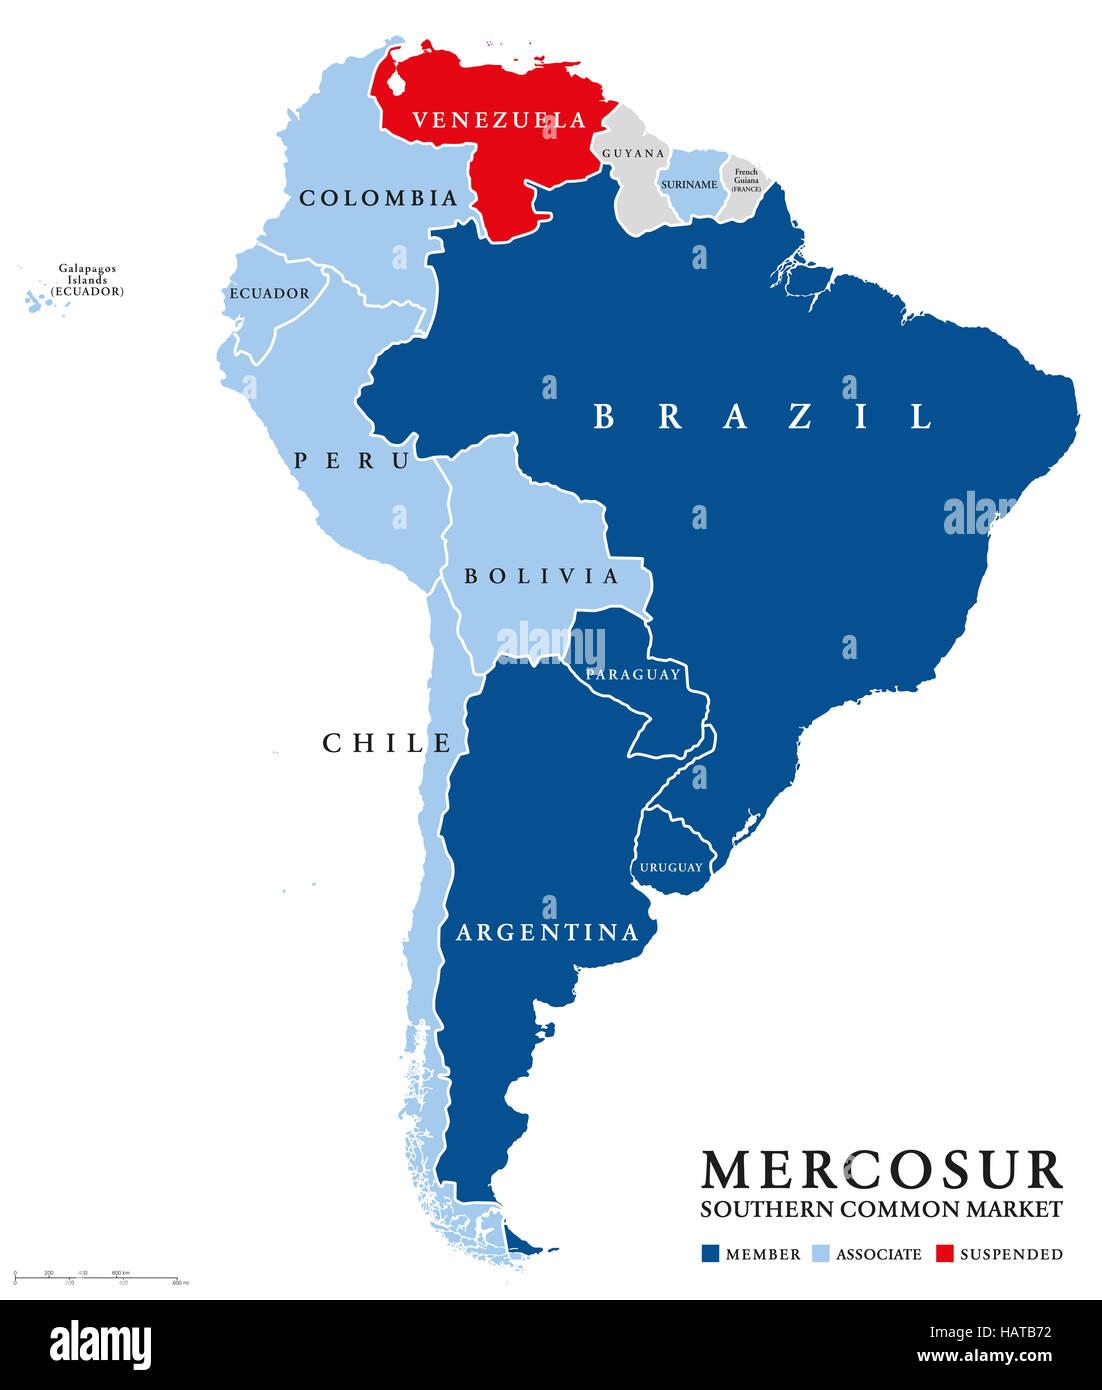 Map Of Venezuela Stock Photos & Map Of Venezuela Stock Images - Alamy